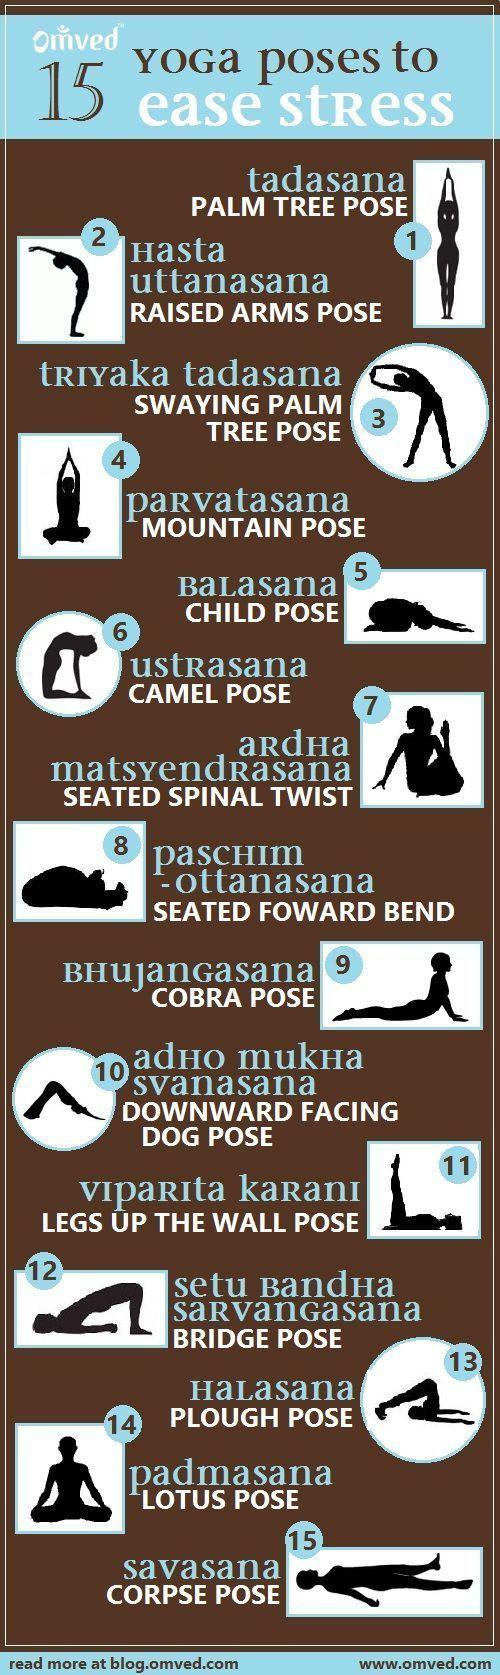 yoga poses to ease stress